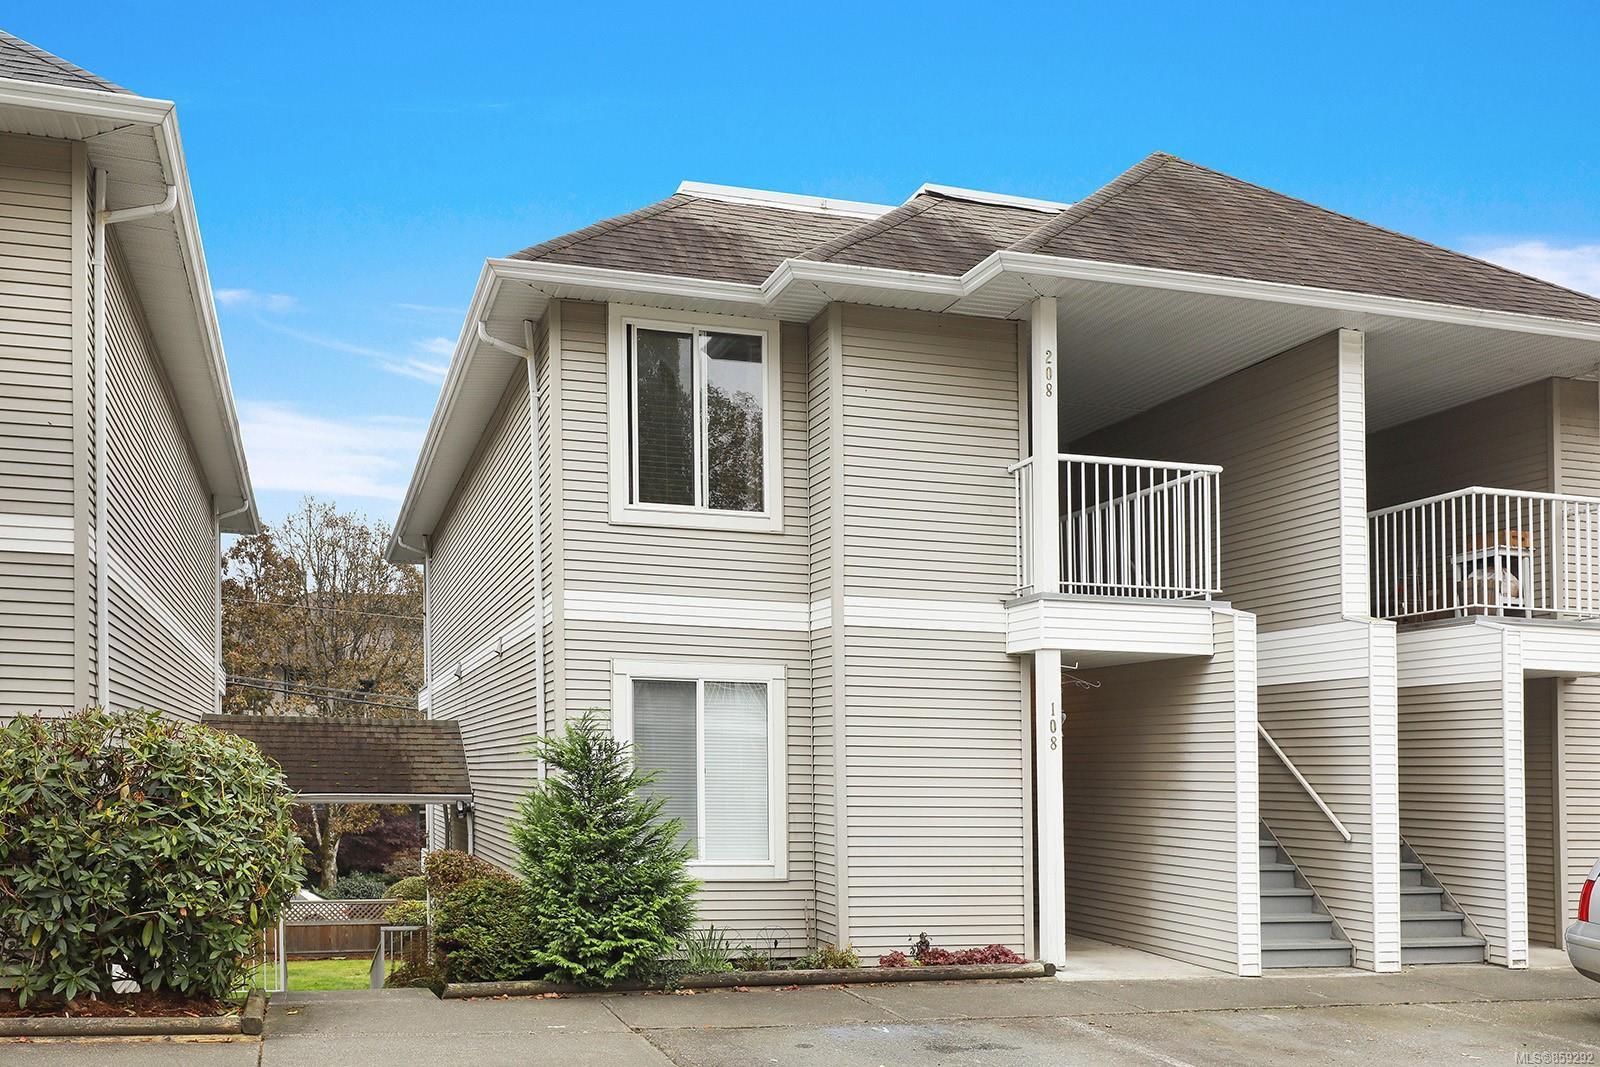 Main Photo: 208 130 Back Rd in : CV Courtenay East Condo for sale (Comox Valley)  : MLS®# 859292